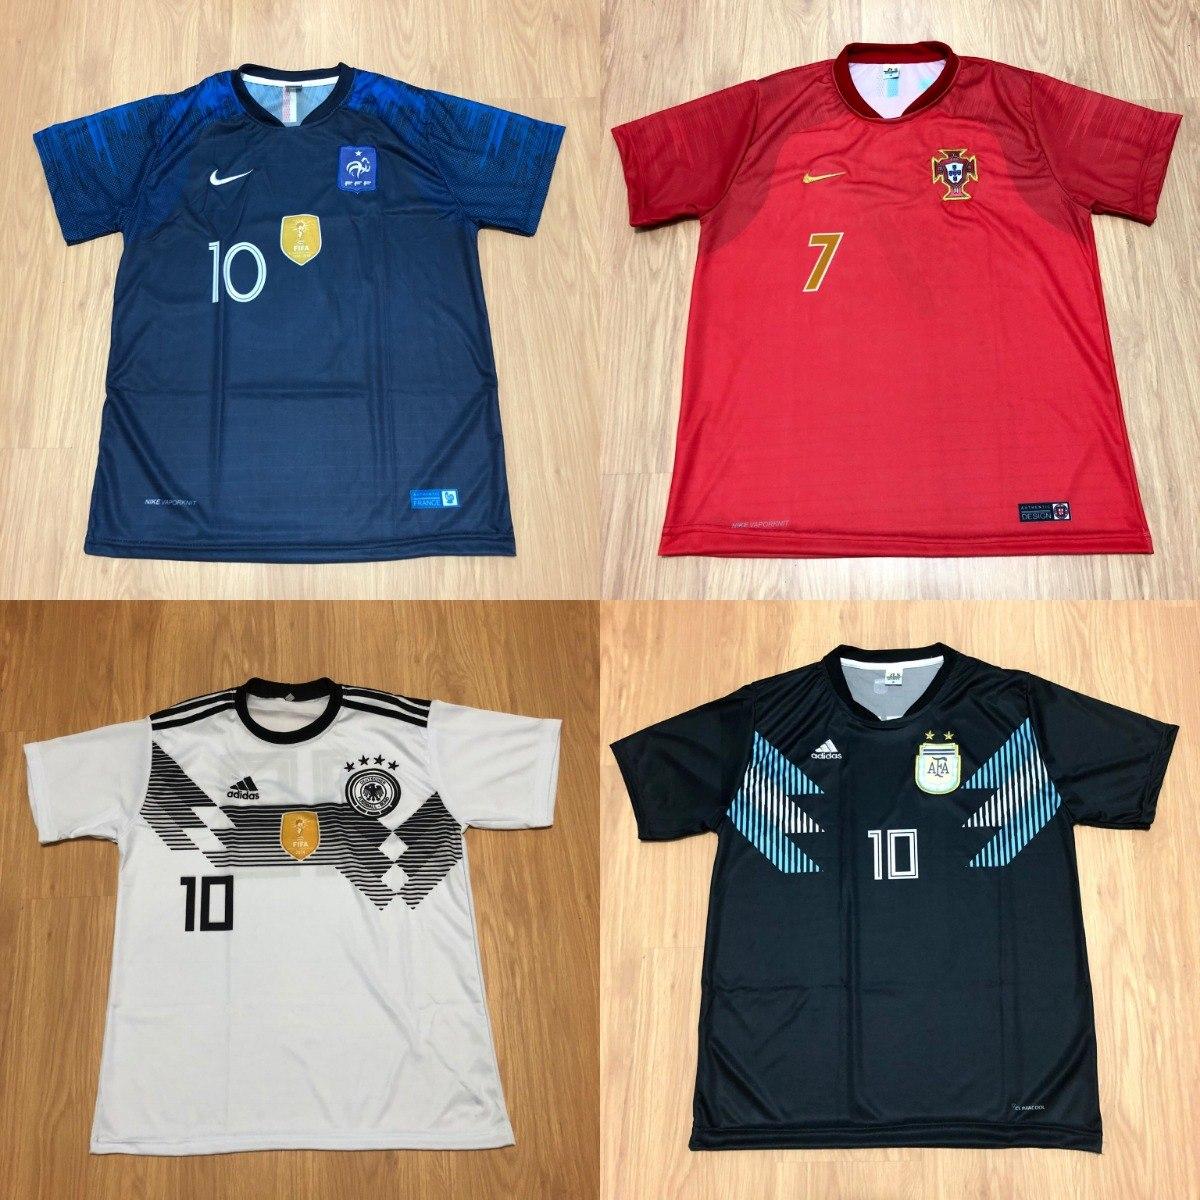 7 camisetas de time atacado futebol 100 modelos barato 2018. Carregando zoom . 28679cf9f3573